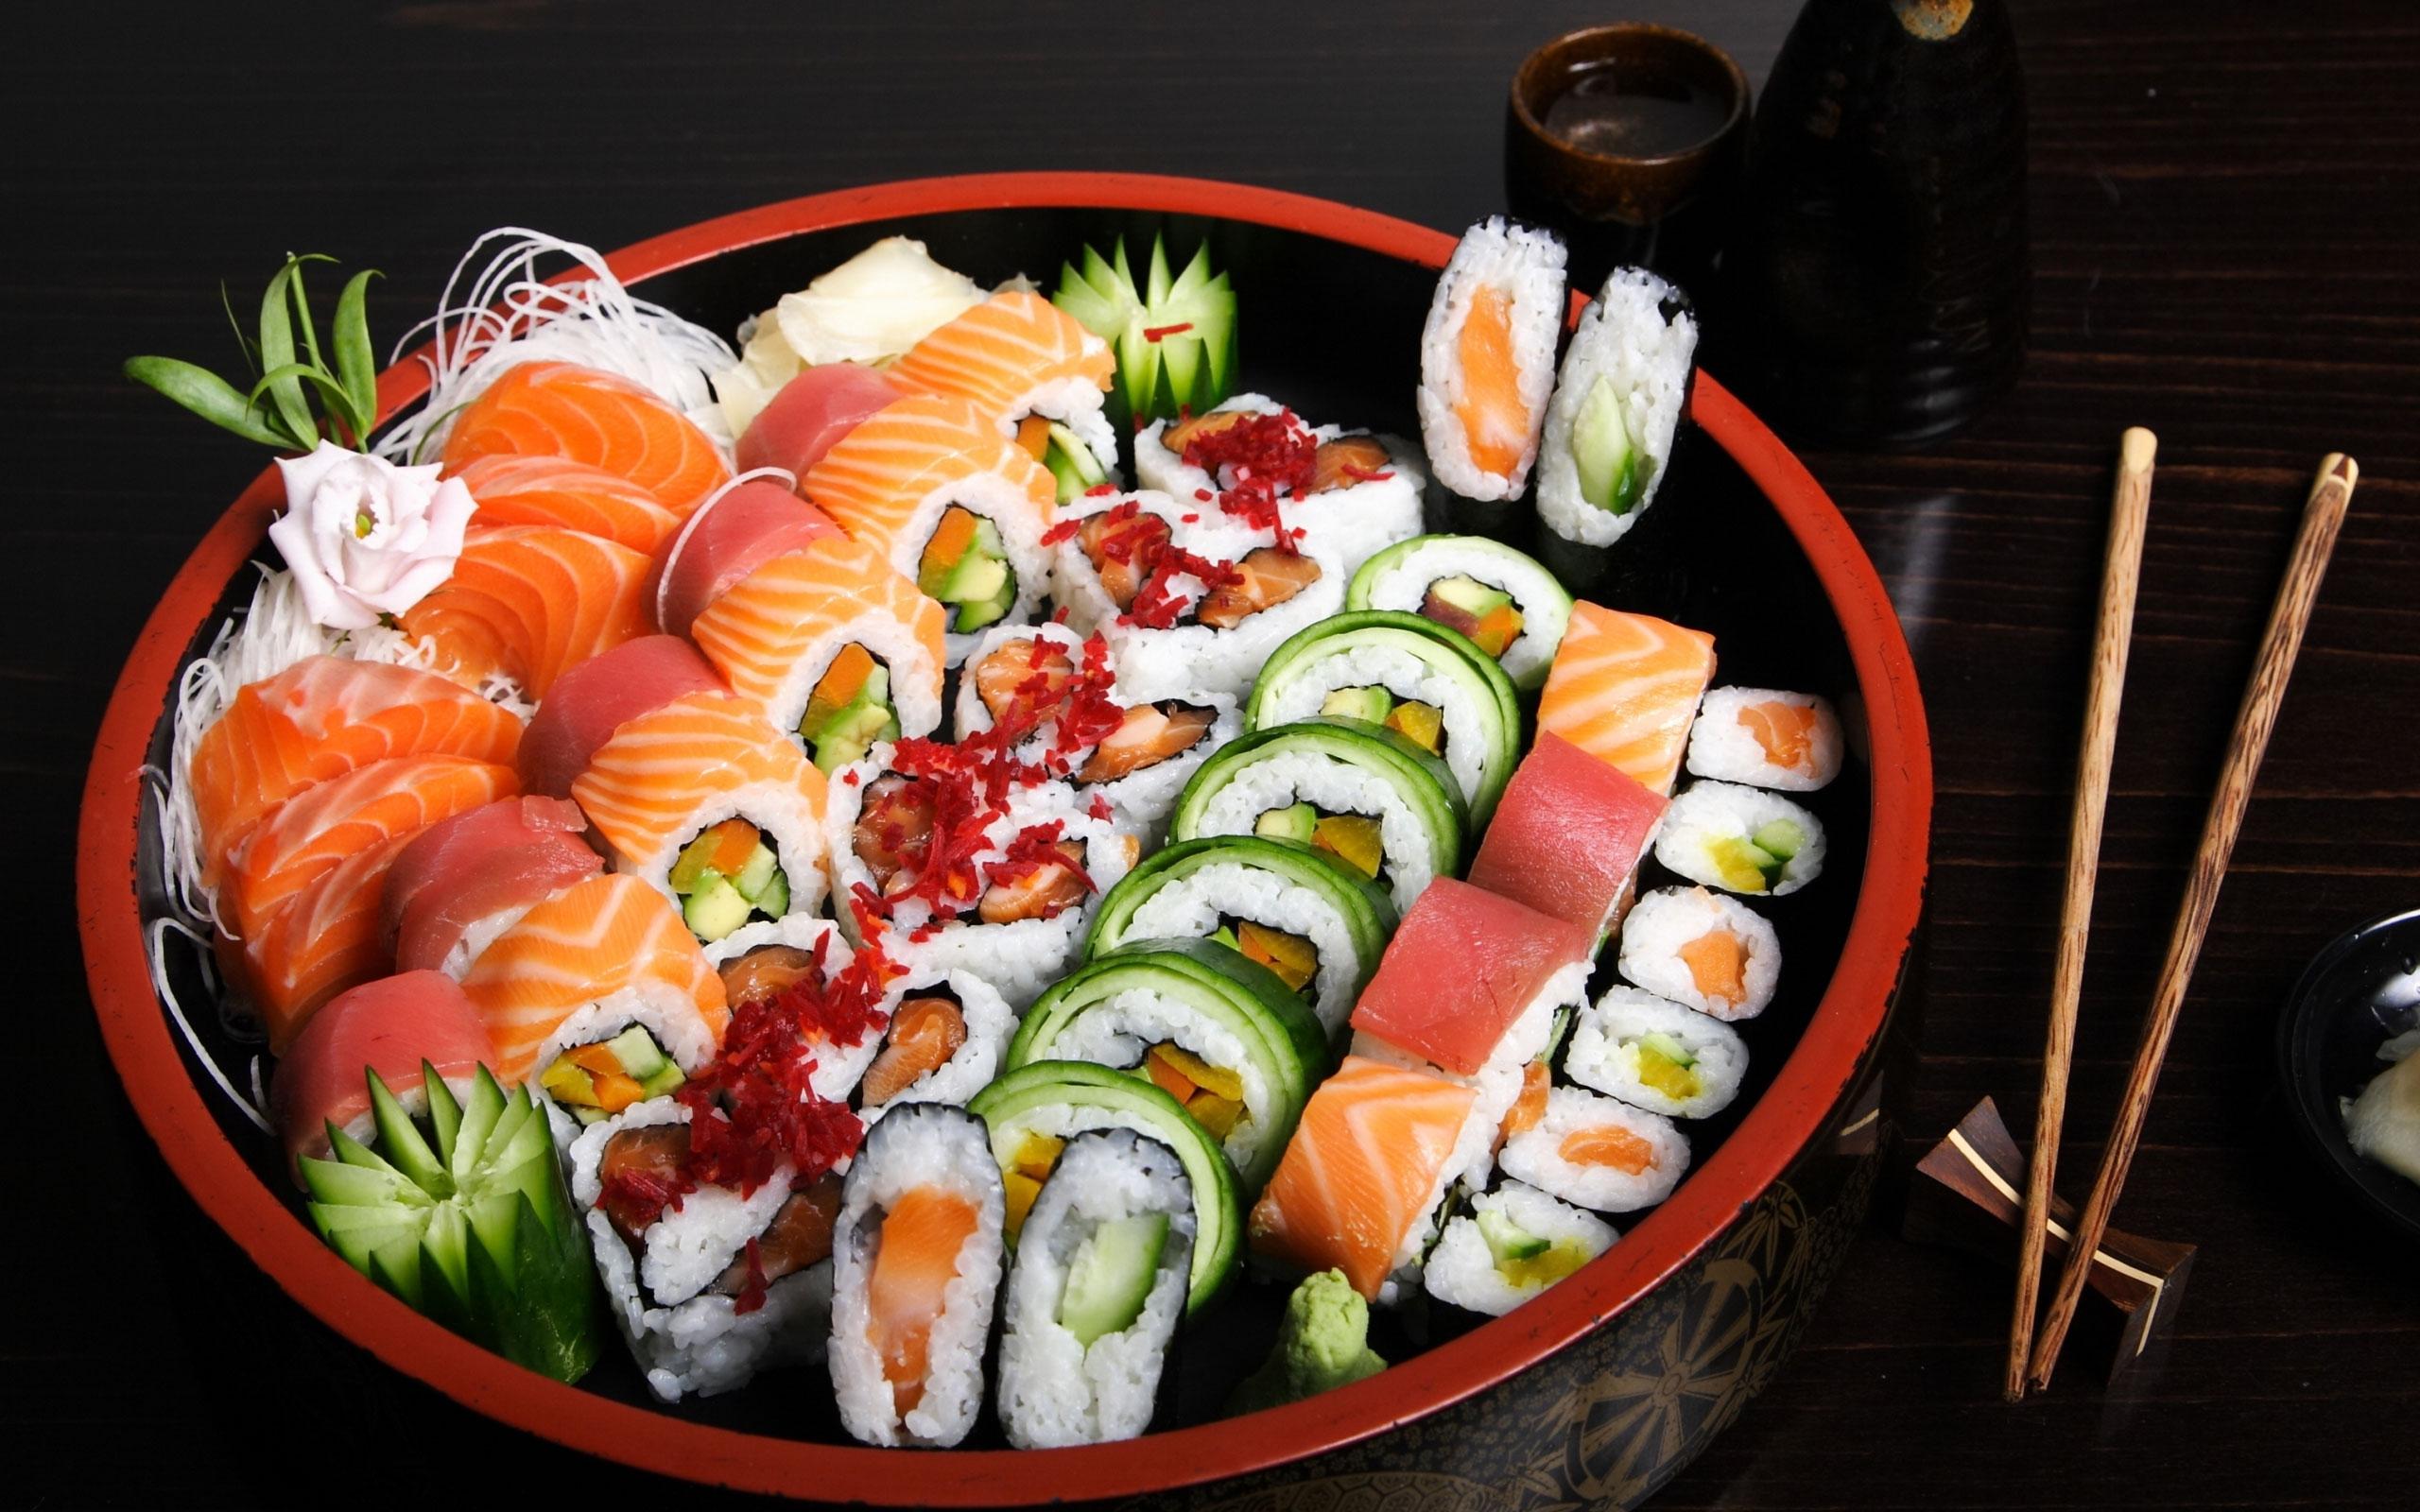 papka-foto-produkty-noyabrya-pitanie-po-sezonu-sushi